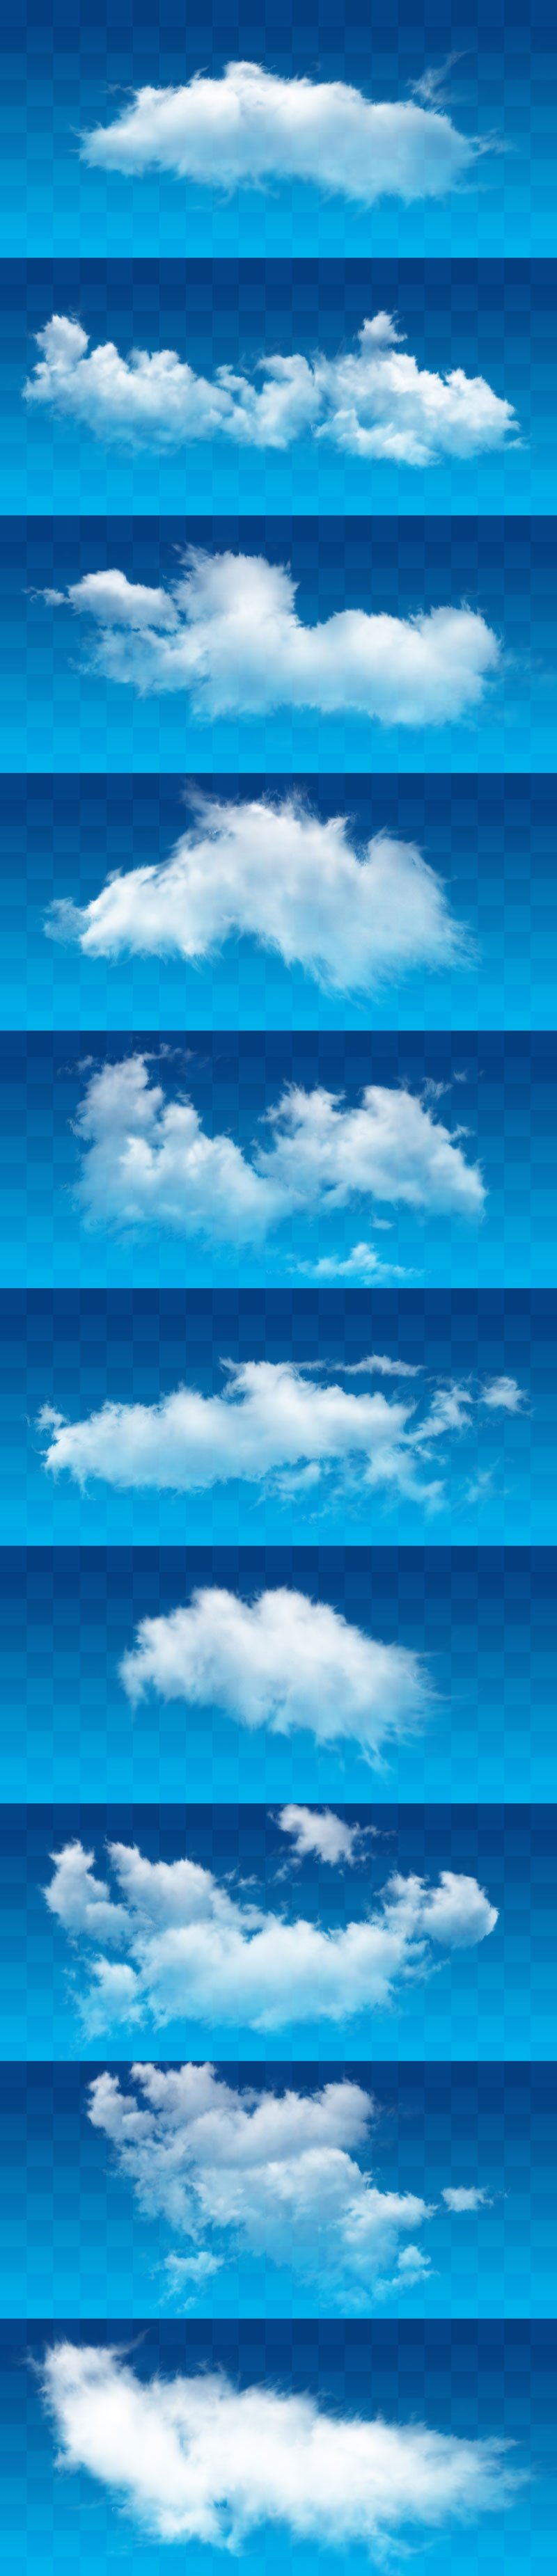 p163 - لایه باز دوربری ابر آسمان